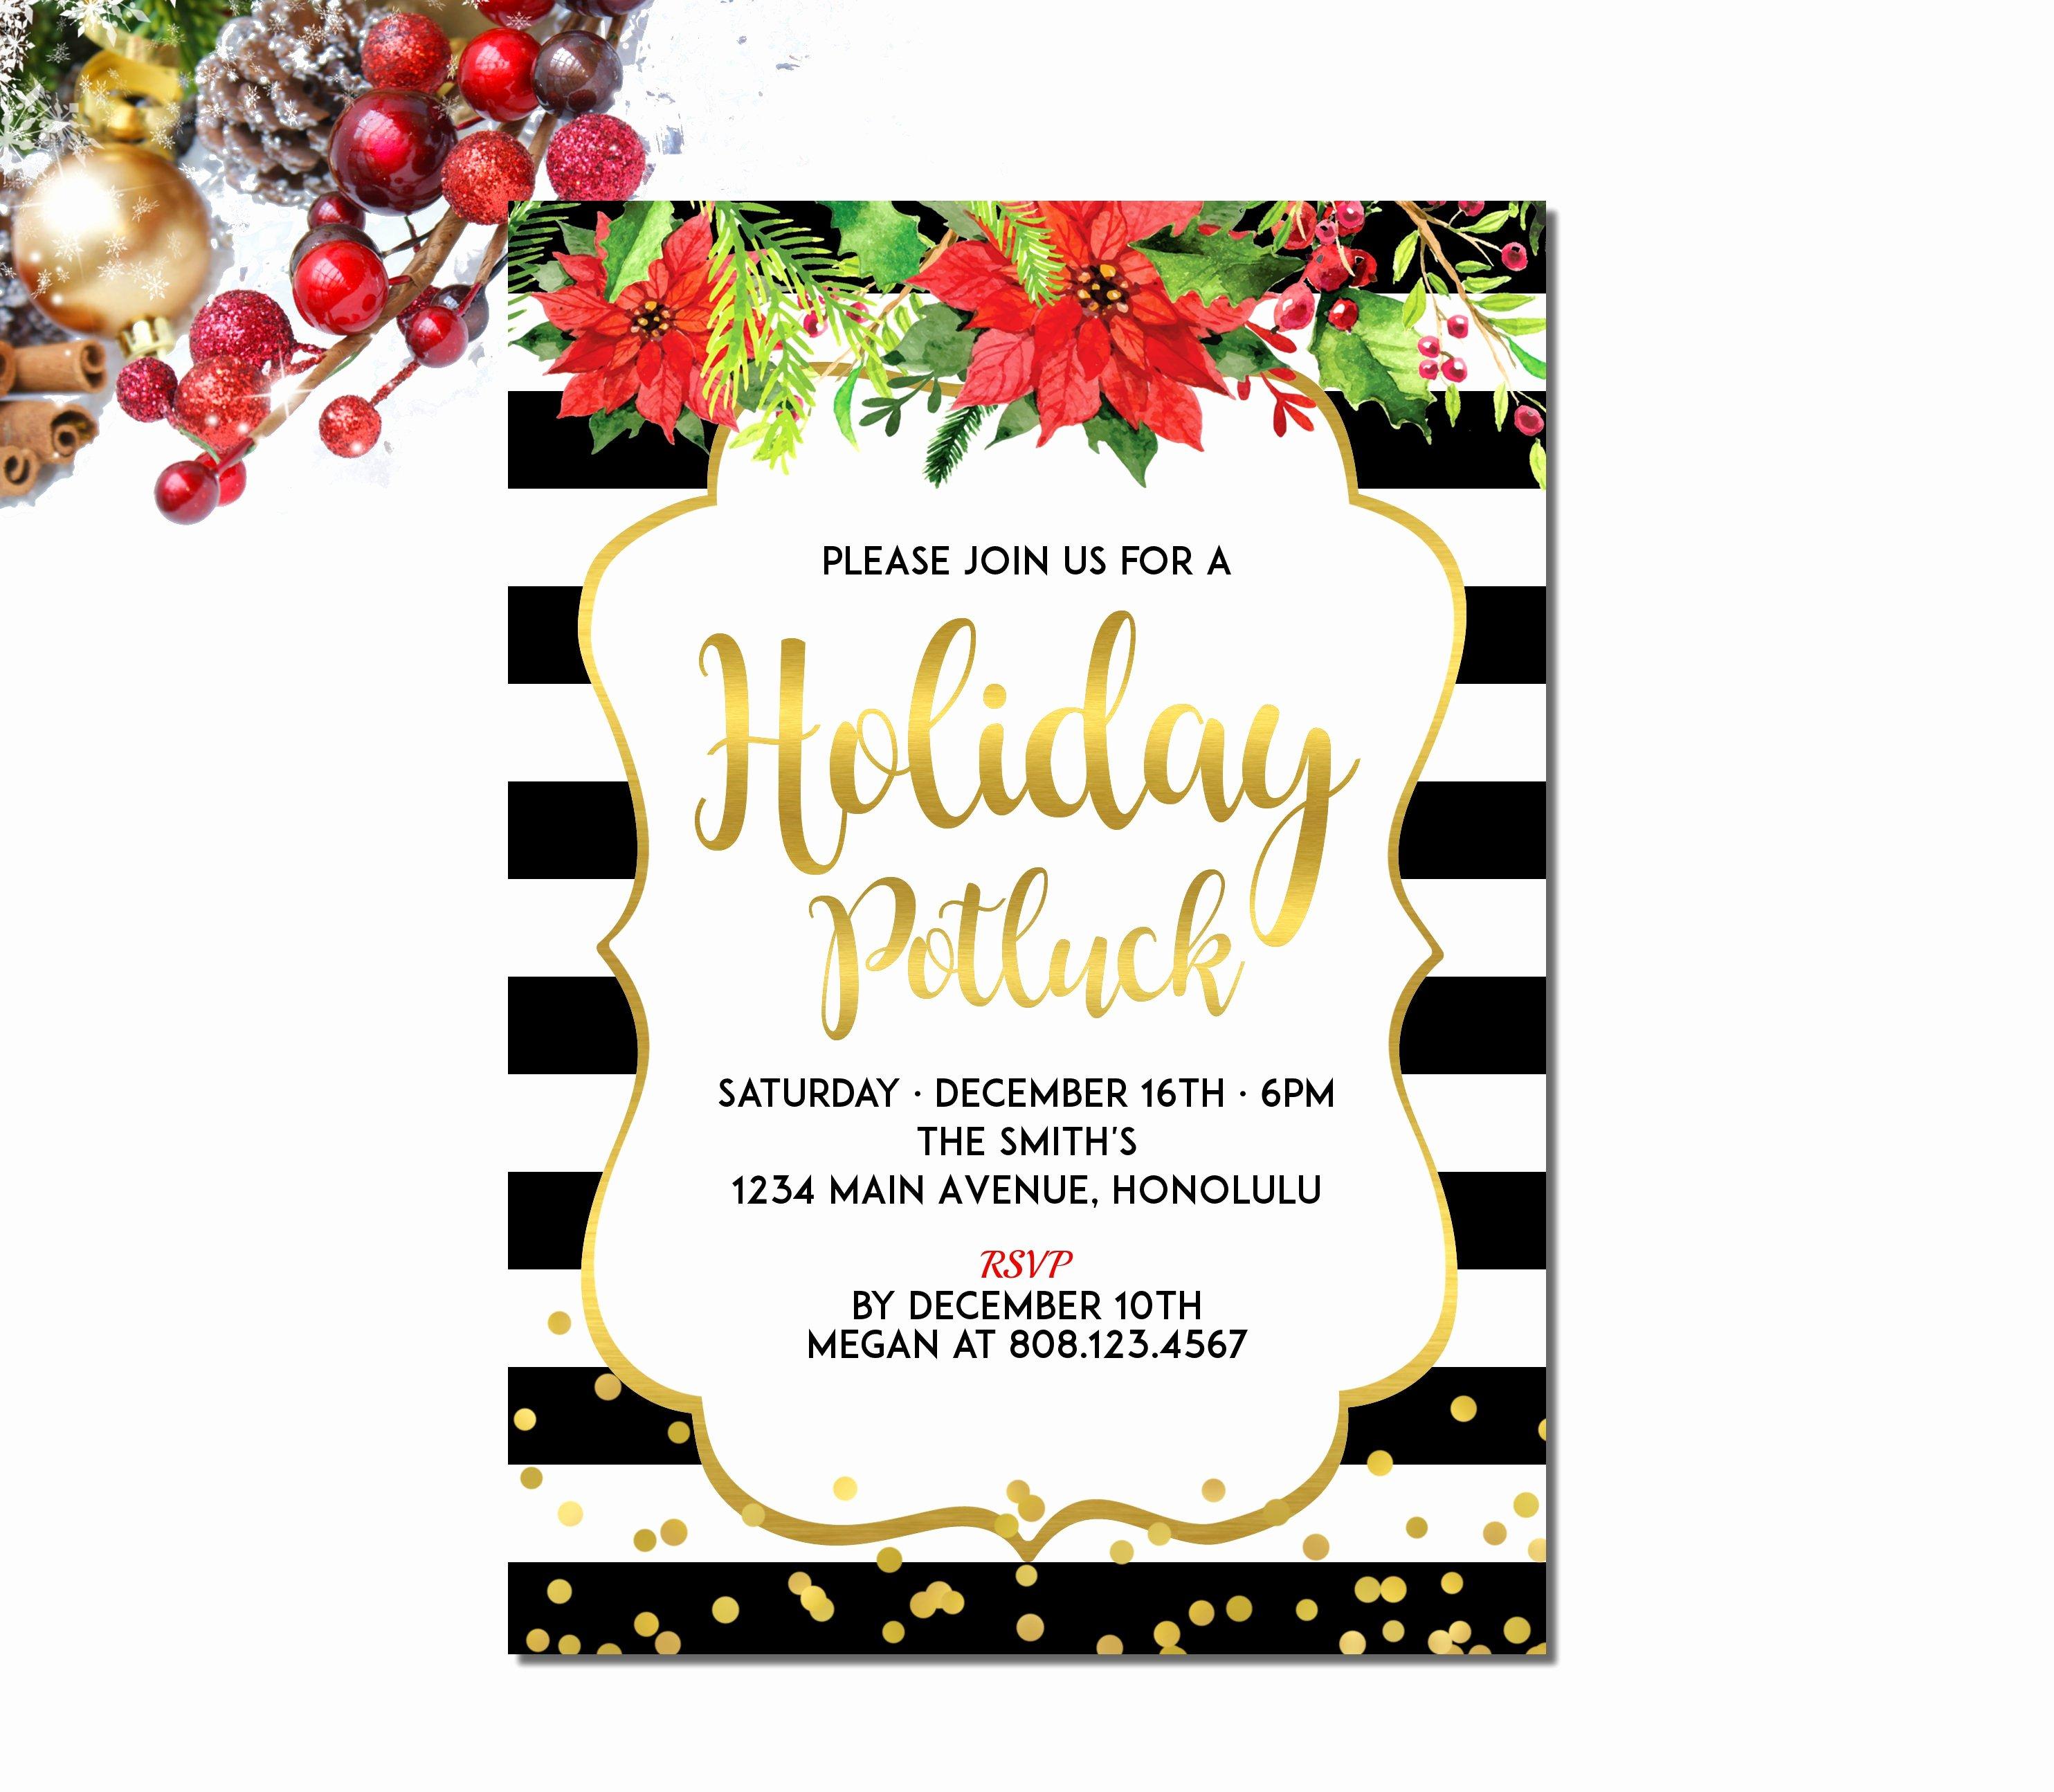 Potluck Party Invitation Wording Beautiful Christmas Potluck Invitation Holiday Potluck Invitation